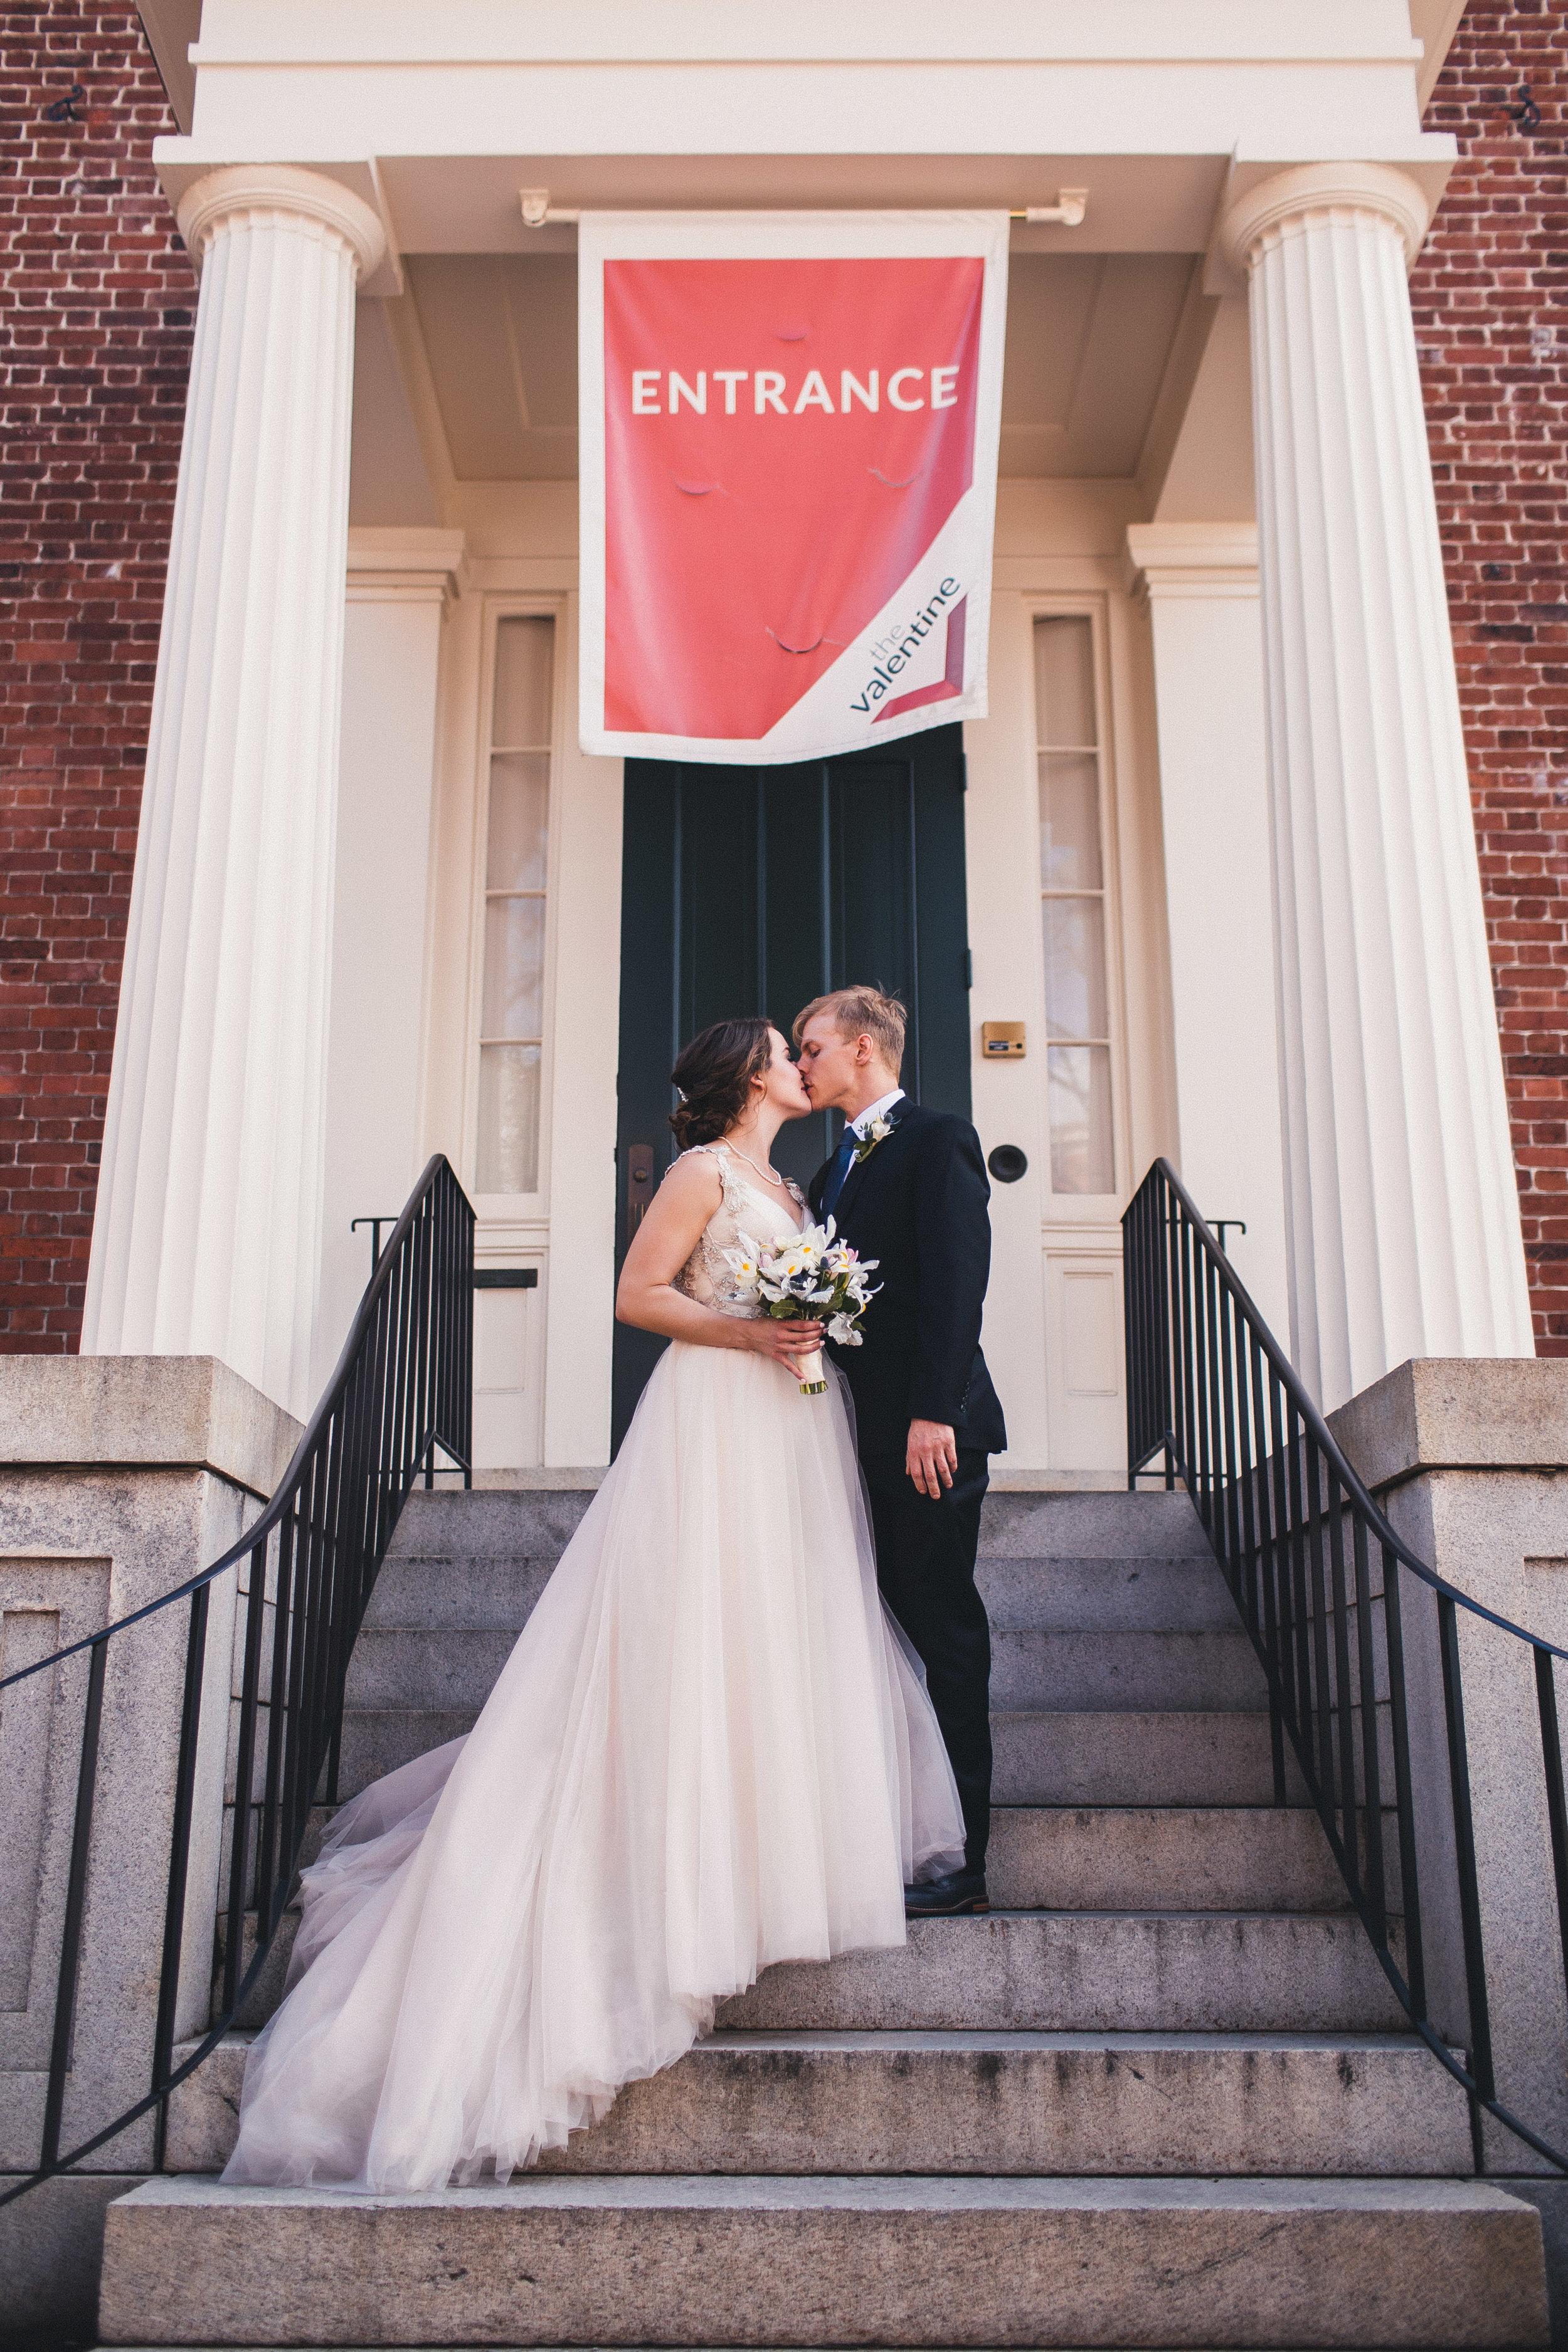 Lindsey & Bert - Wedding 4.1.17-352.jpg